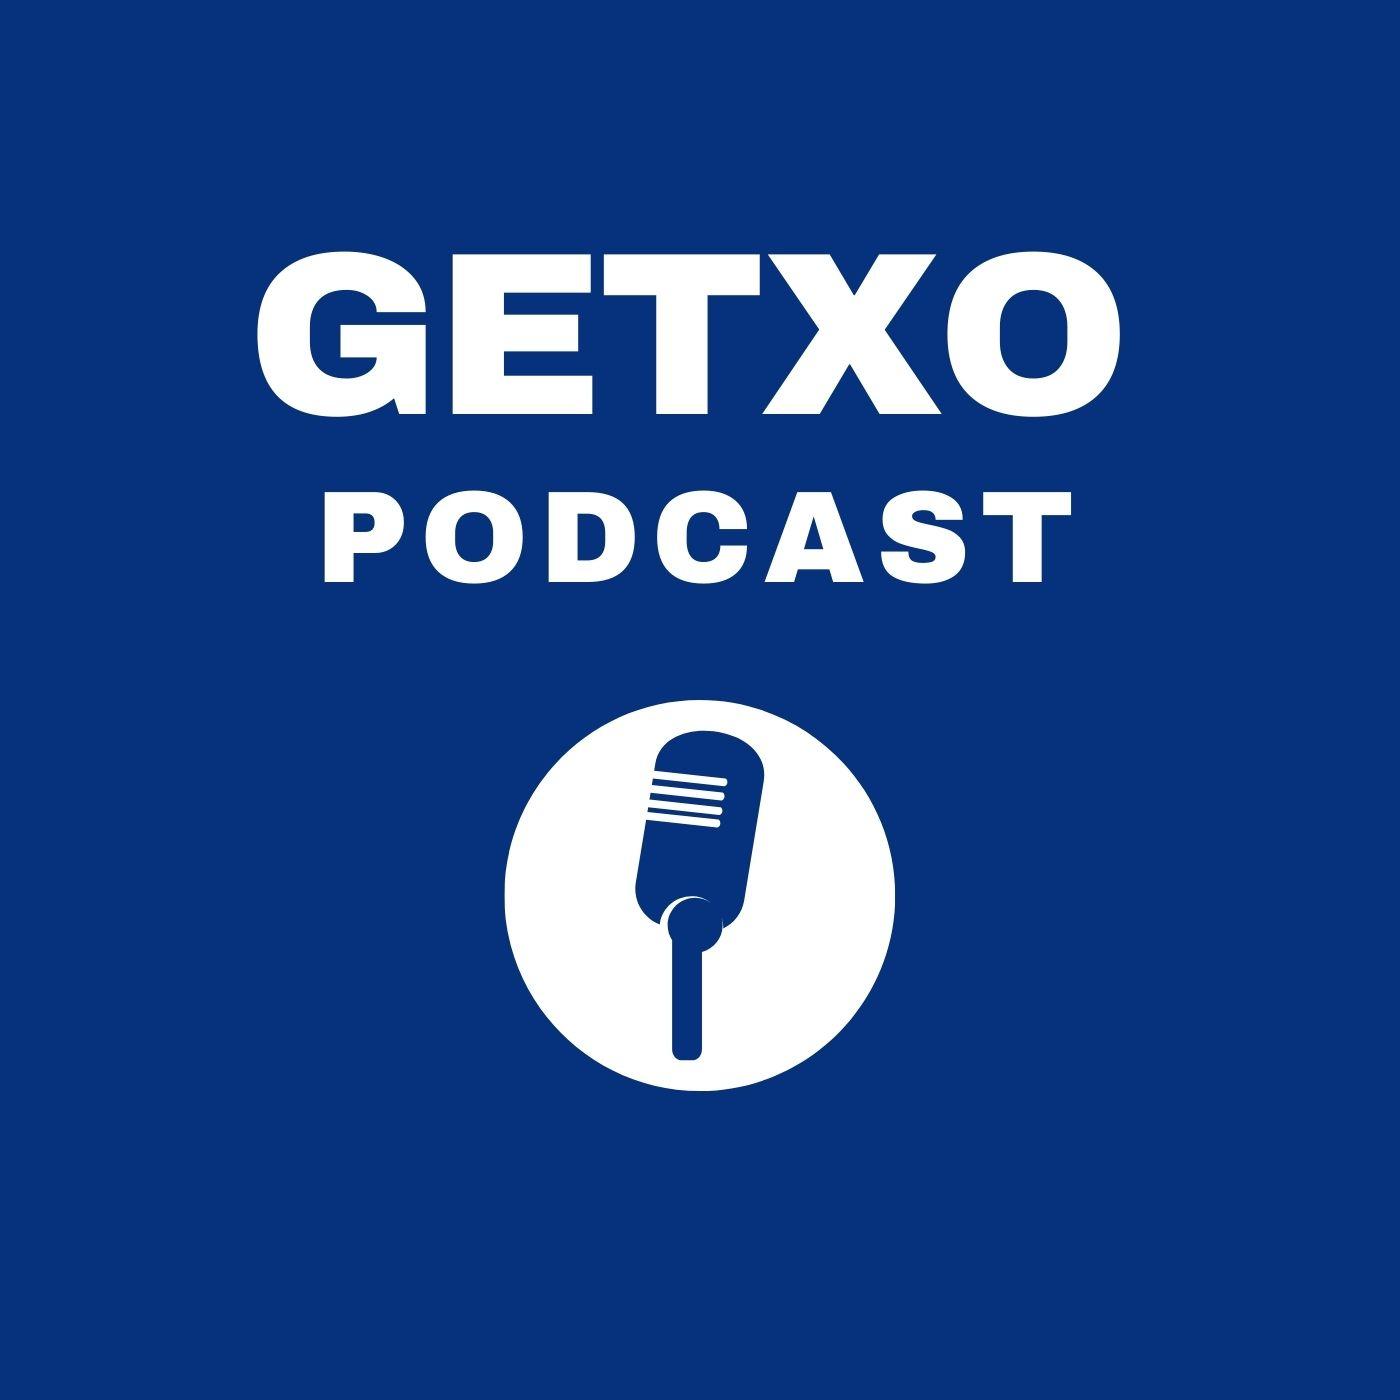 Getxo Podcast